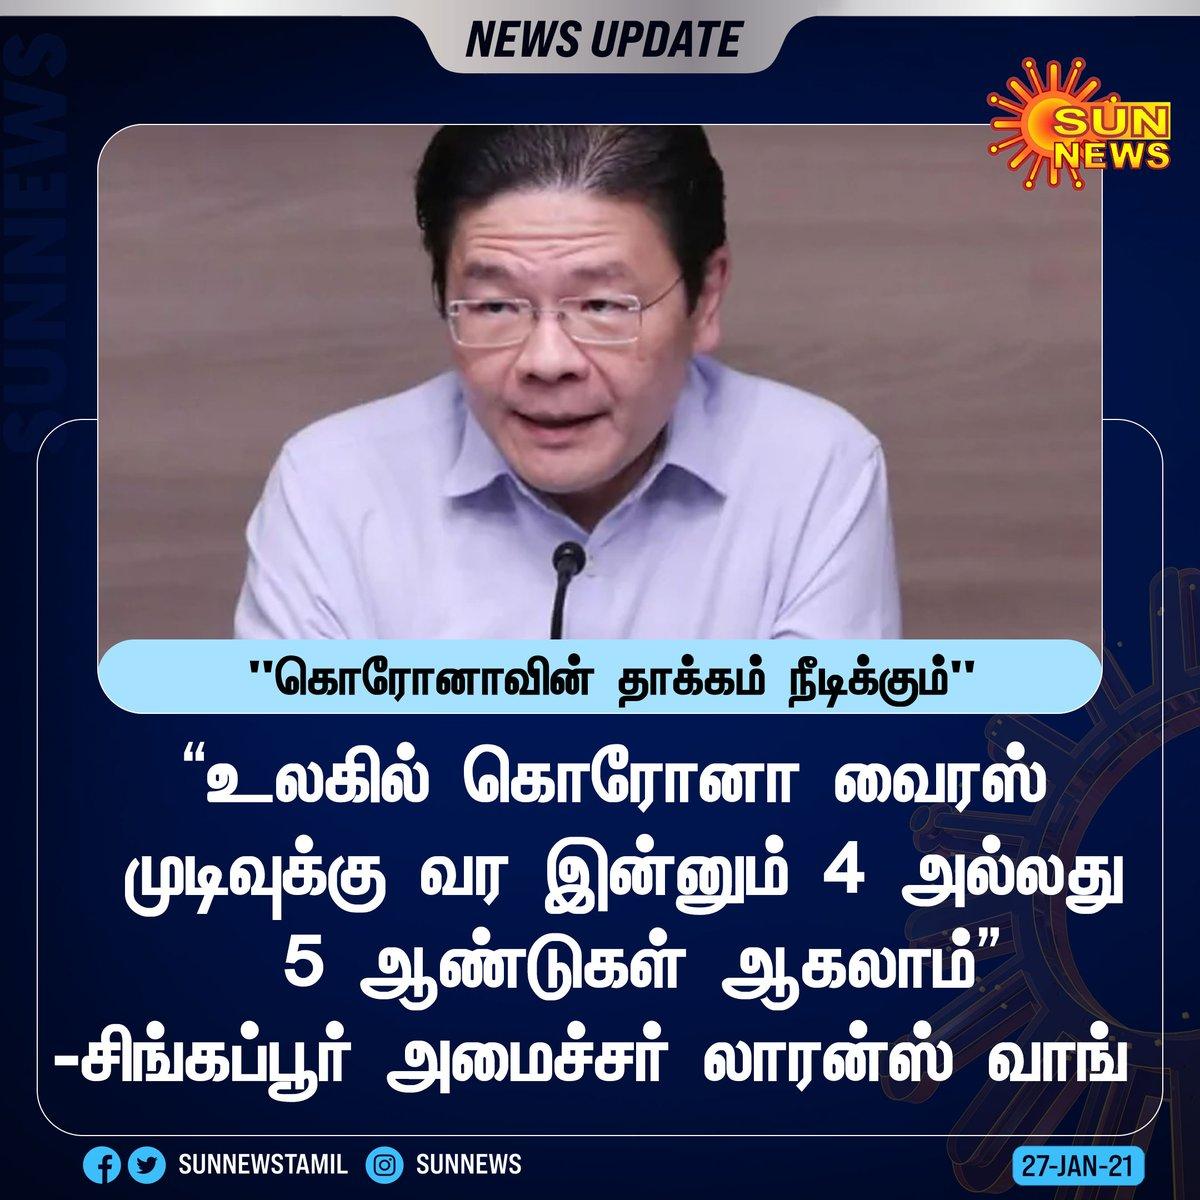 "#NewsUpdate | ""கொரோனாவின் தாக்கம் நீடிக்கும்"" - சிங்கப்பூர் அமைச்சர் லாரன்ஸ் வாங்     #Sunnews | #Singapore | #CoronaVirus |"